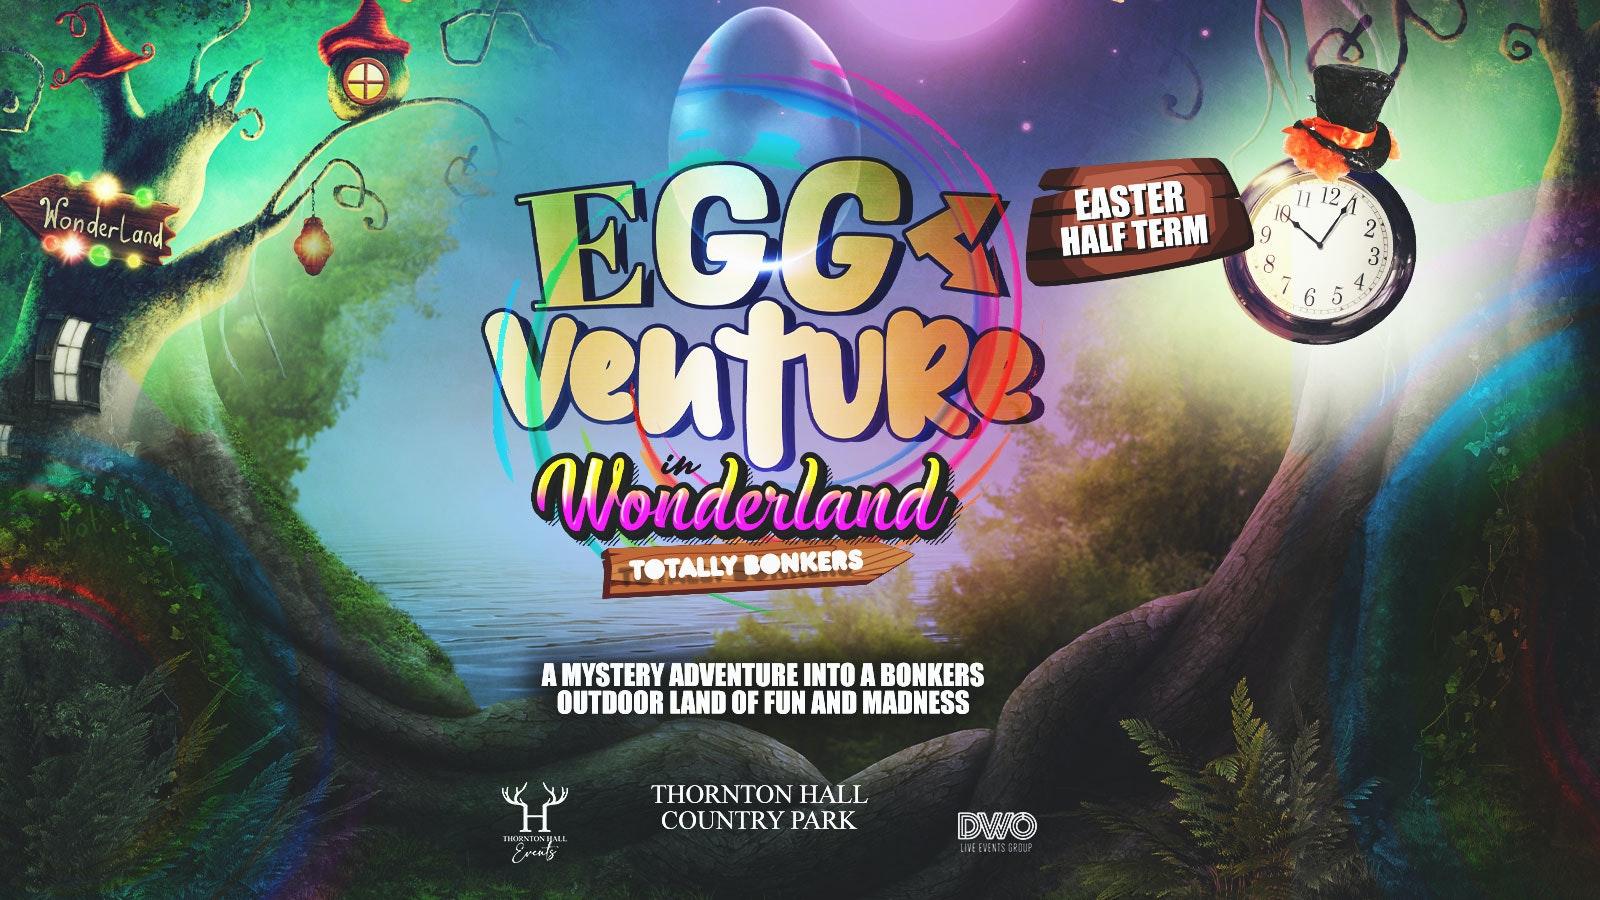 EggVenture in Wonderland – Saturday 10th April – 1pm